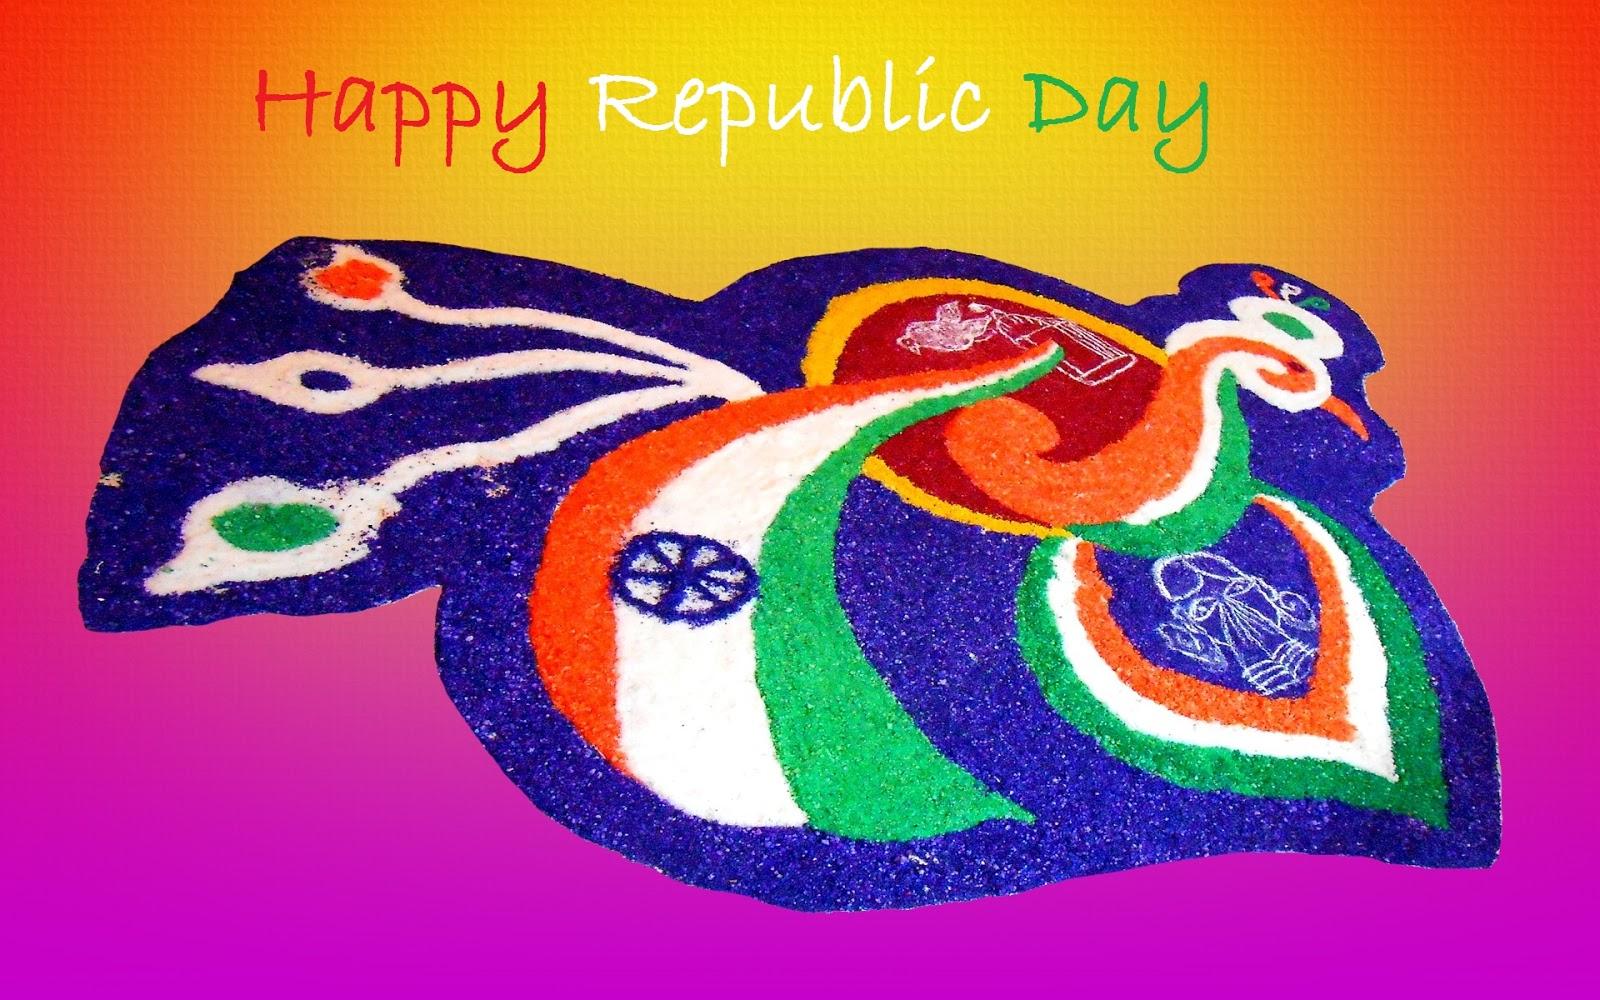 Ugadi Hd Wallpapers Free Download 26th Jan Patriotic Rangoli Designs For Republic Day 2018